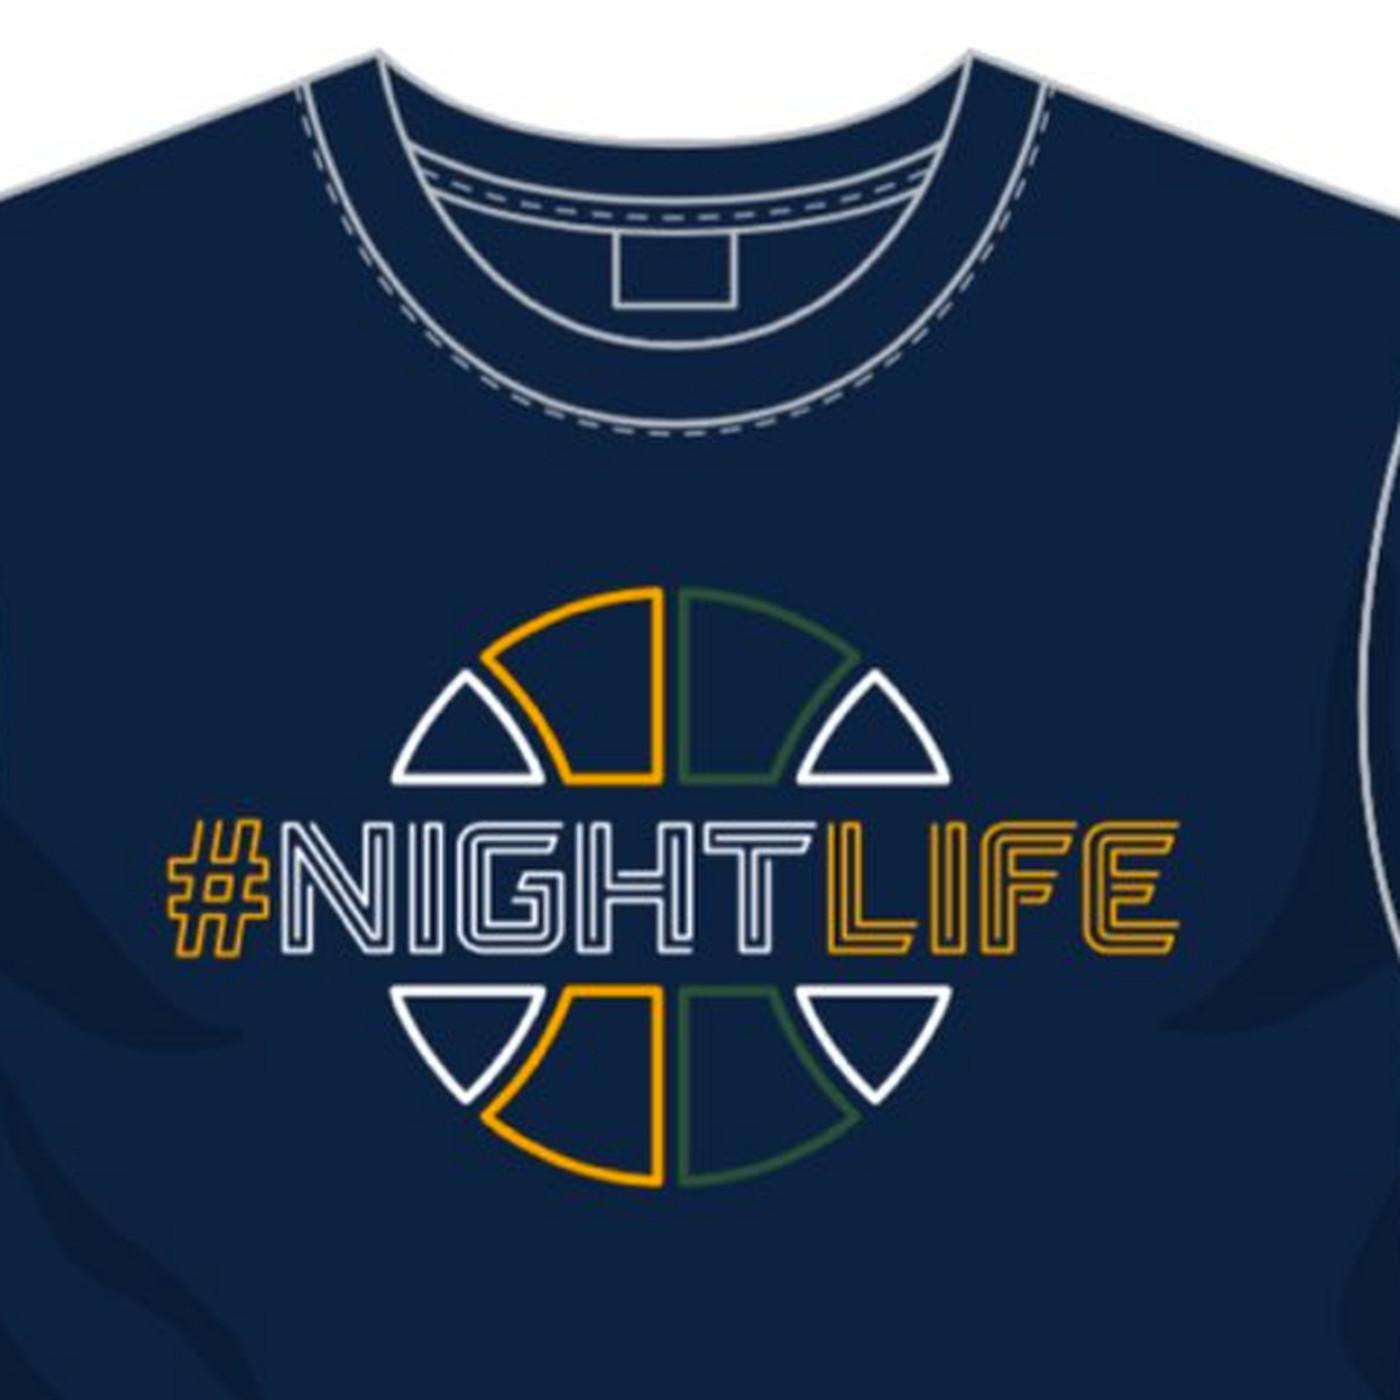 228a6c48afe Utah Jazz poke fun of Warriors with shirts that read  Nightlife -  SBNation.com